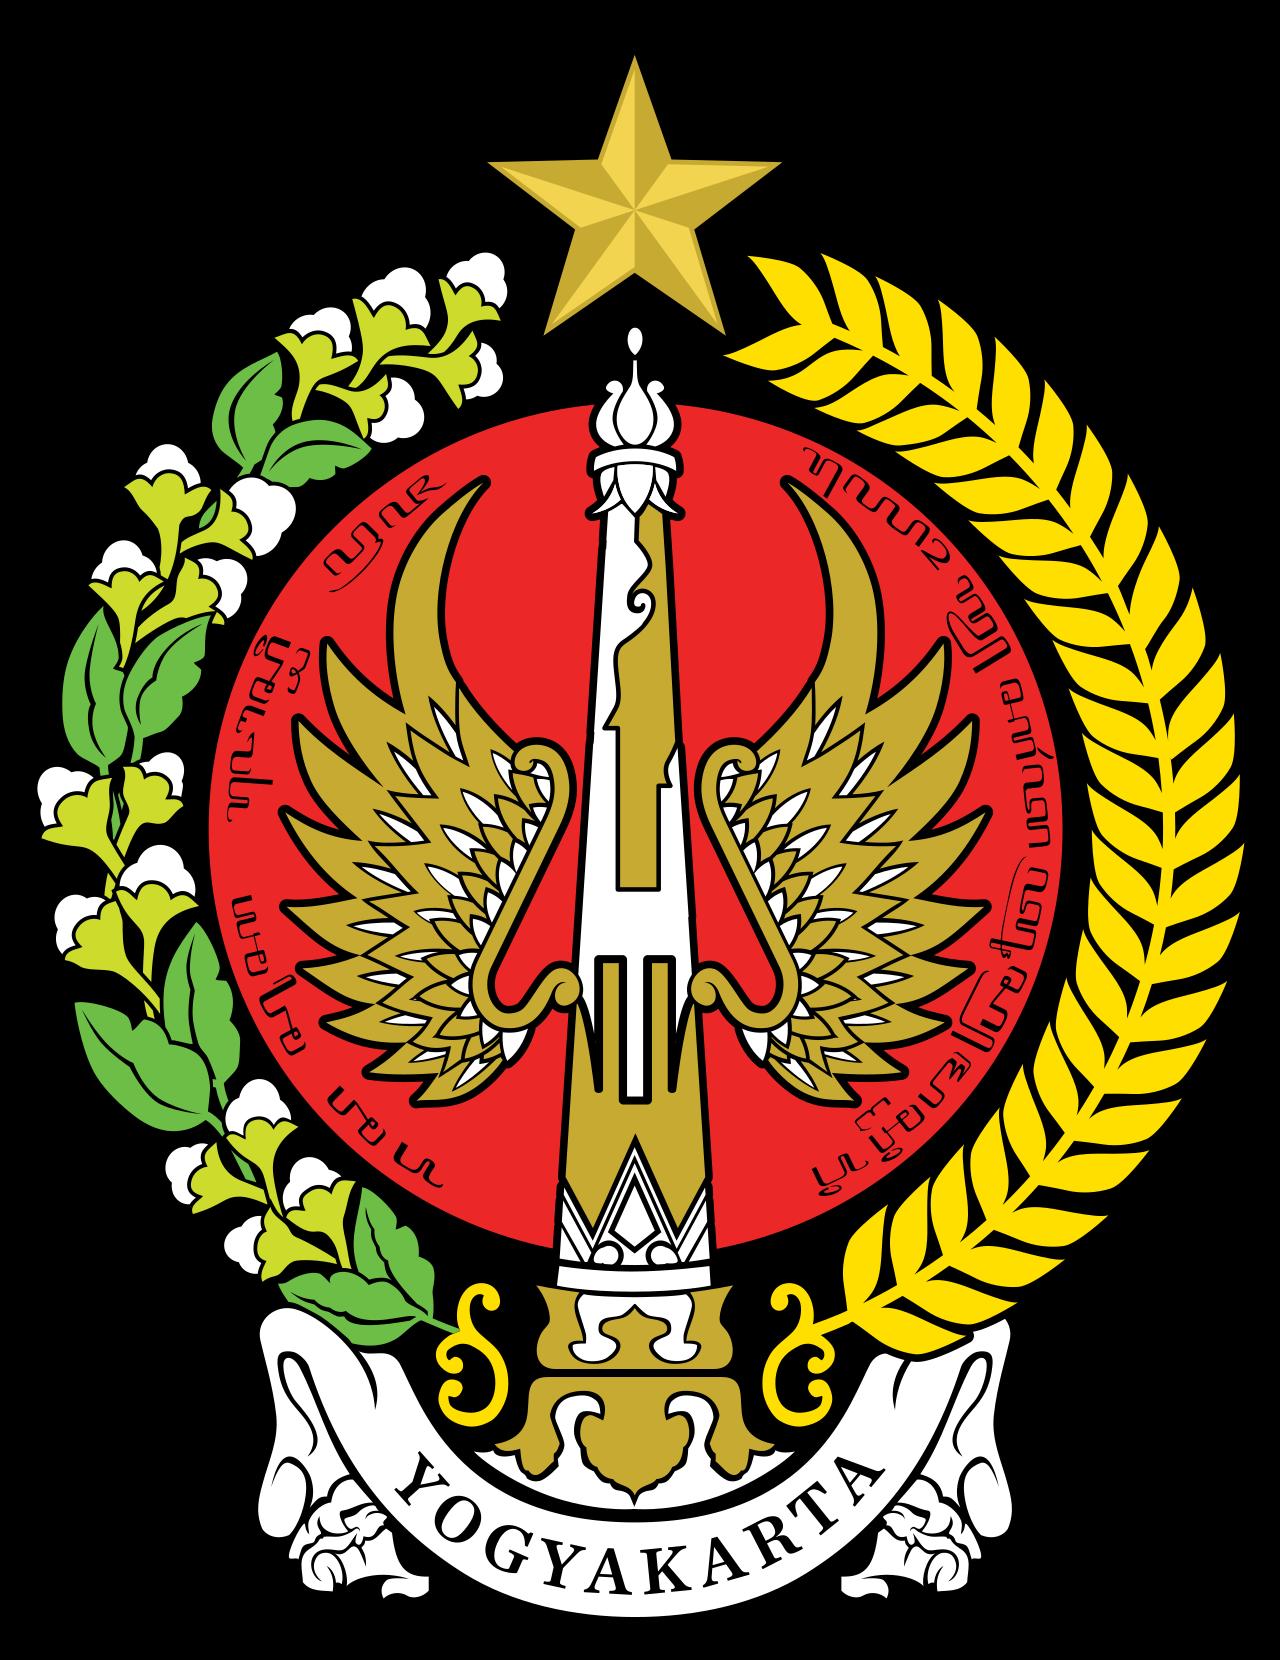 Special Region Of Yogyakarta Wikipedia In 2020 Yogyakarta Special Region Of Yogyakarta Drawings